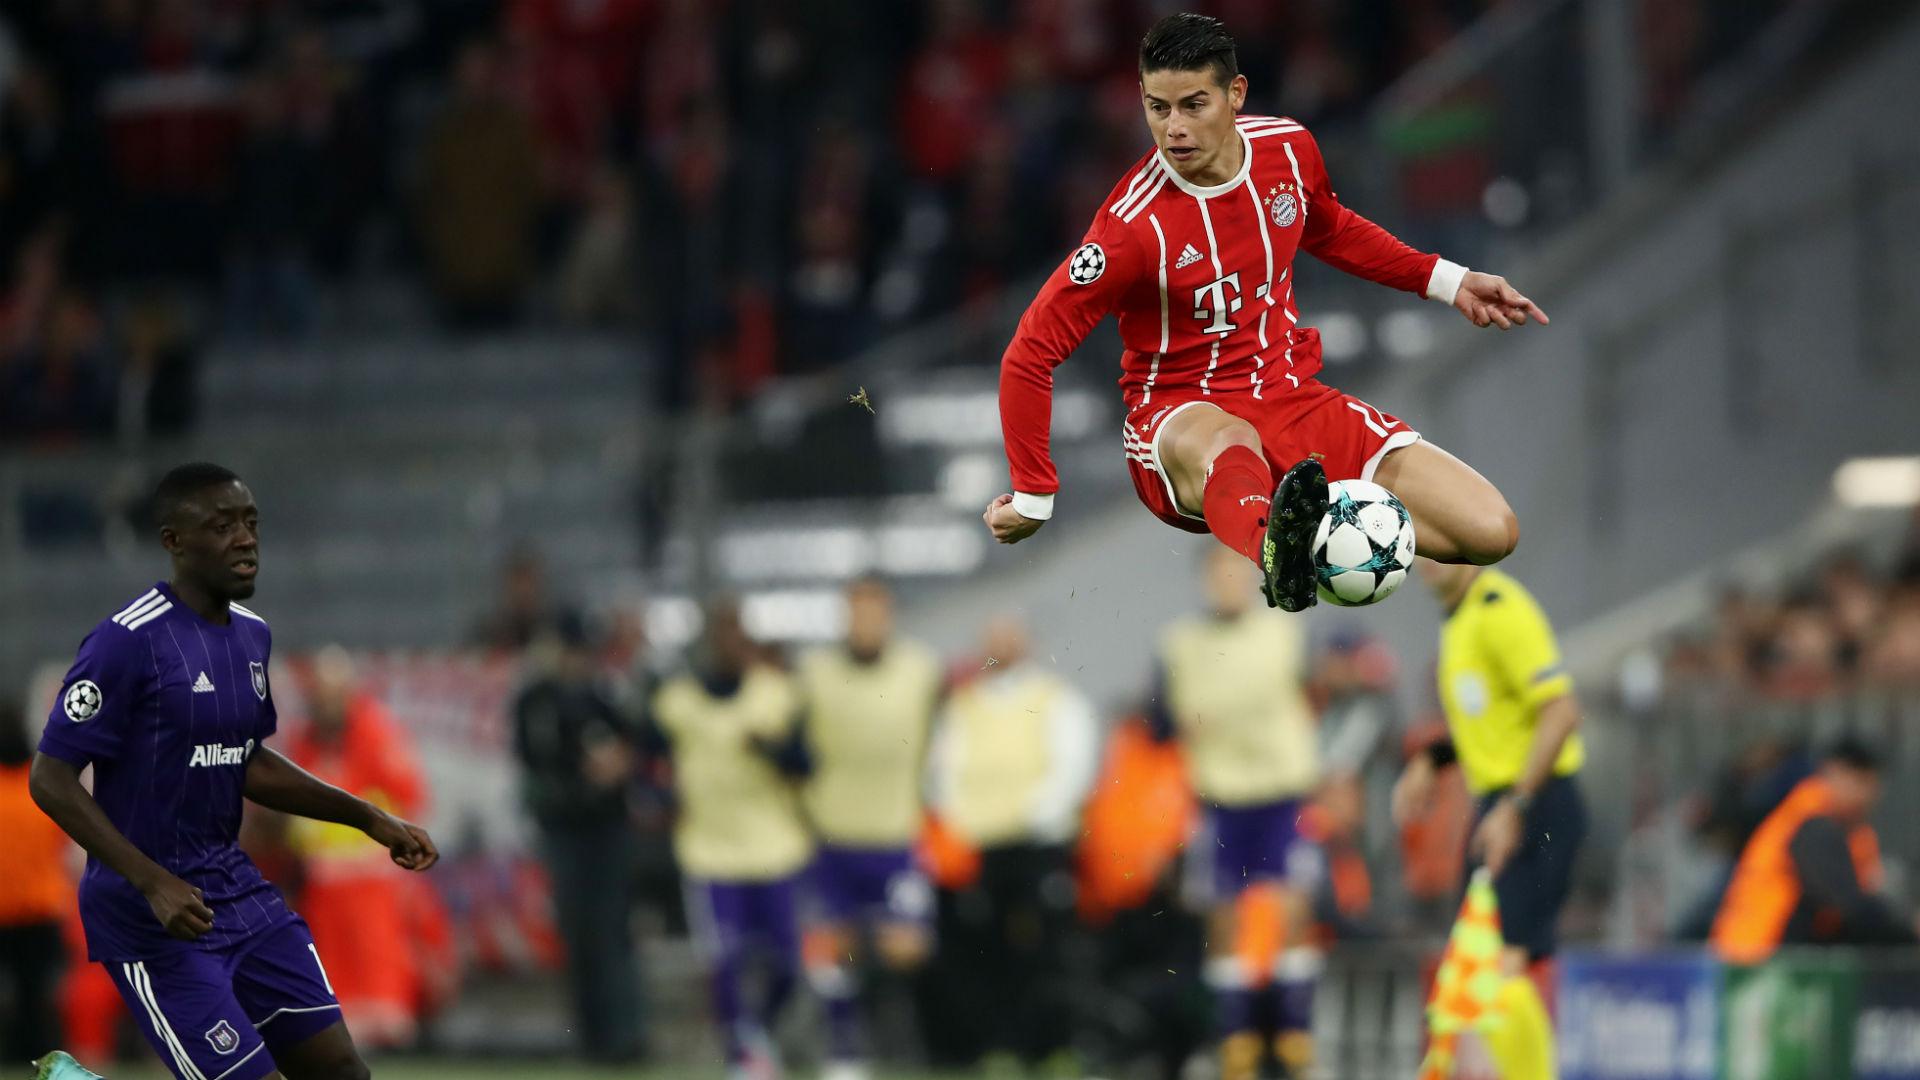 Loss to Hoffenheim, poor effort causing concerns at Bayern Munich